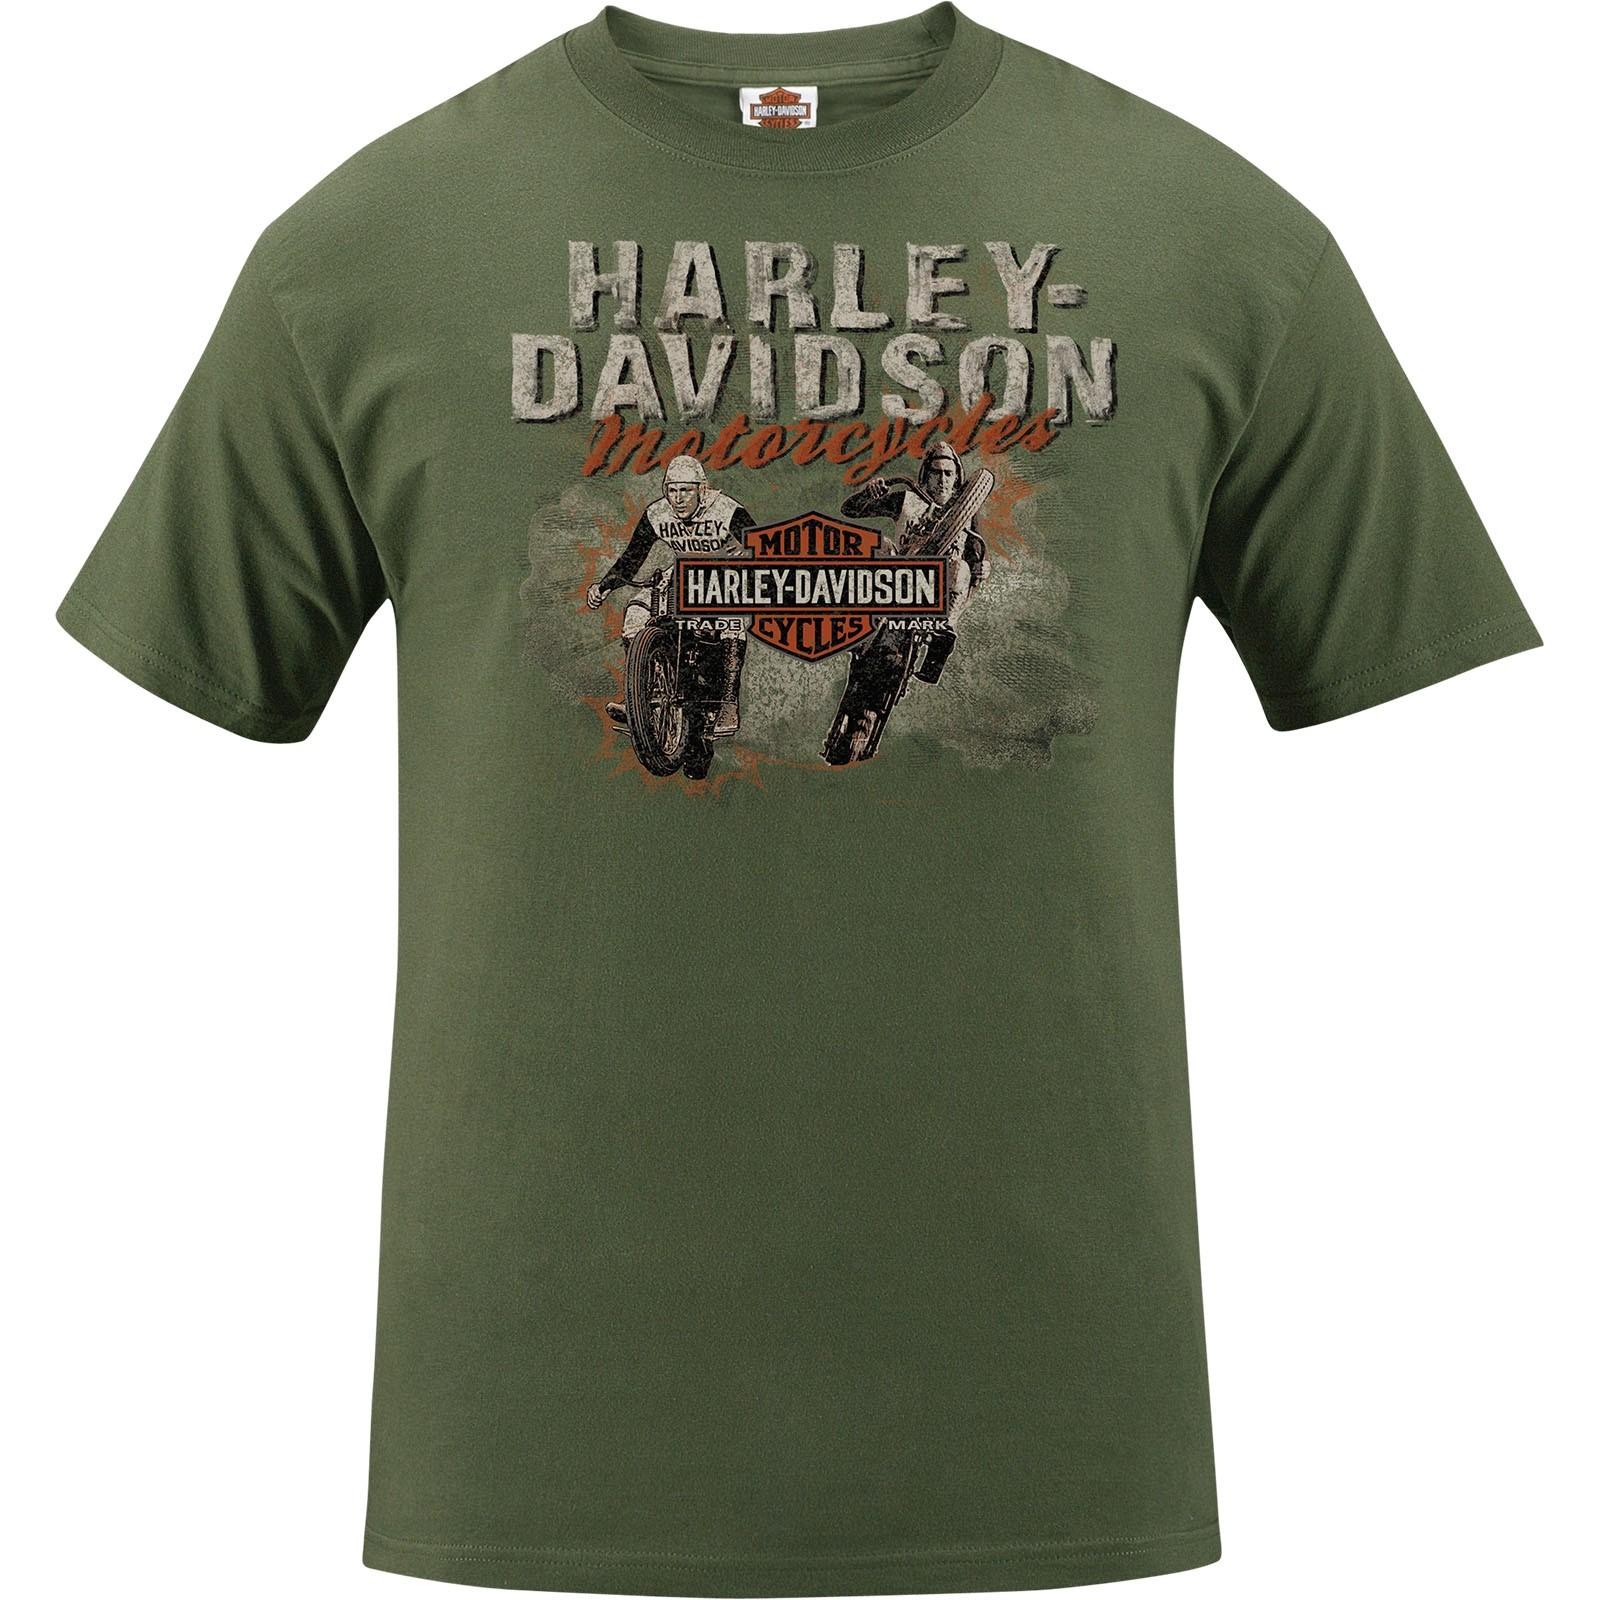 7fad8ba6 Harley-Davidson Men's Short-Sleeve Tee - NSA Naples | Hill Racers